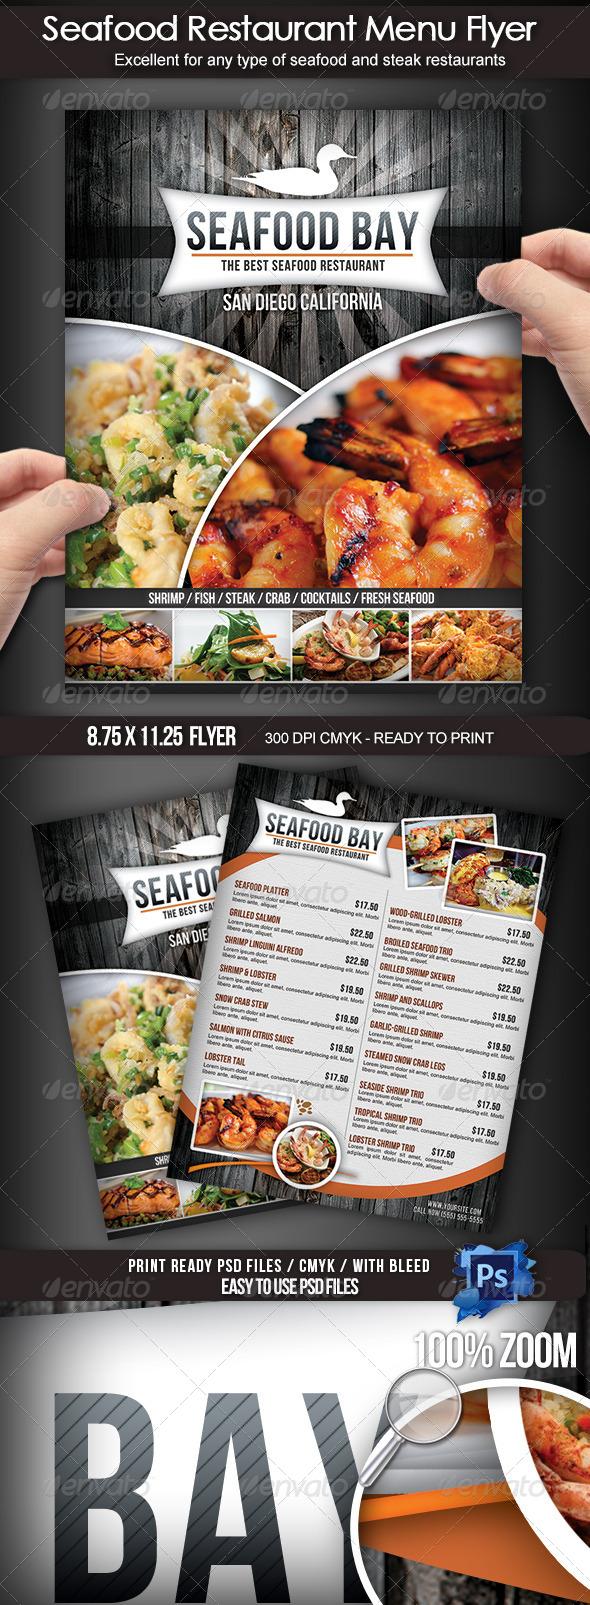 Seafood Restaurant Menu Flyer - Restaurant Flyers